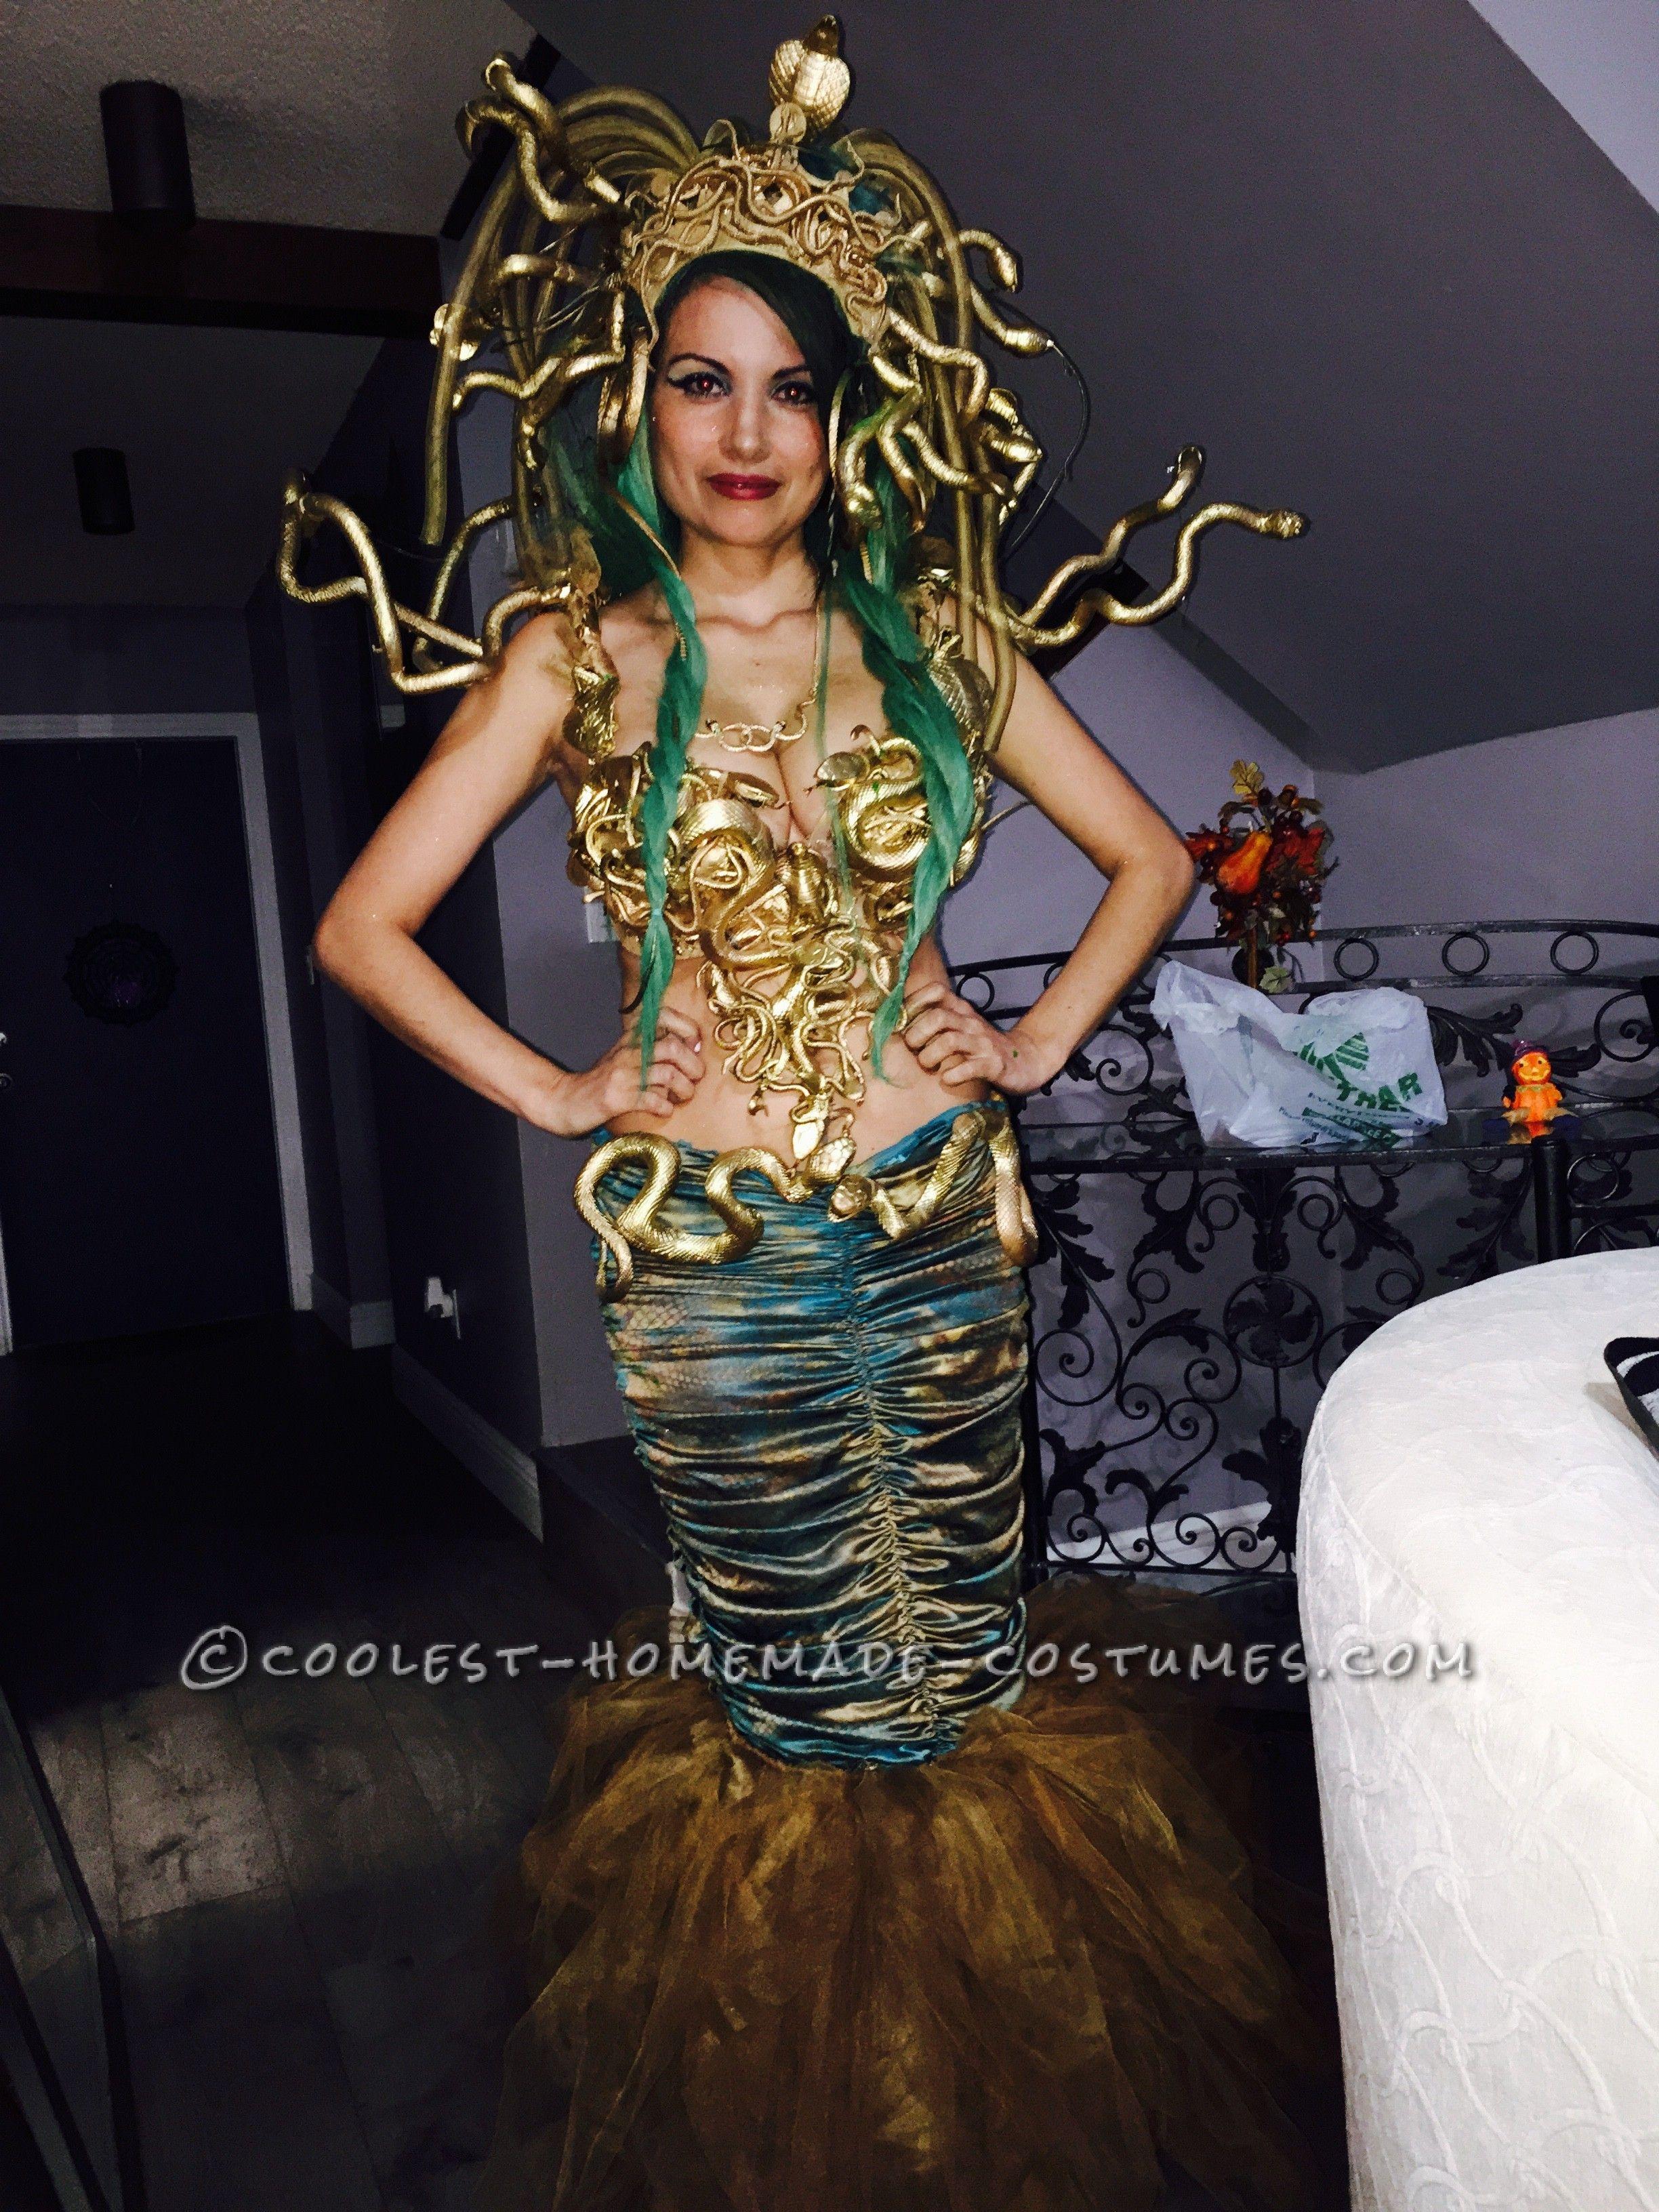 Sexy mudusa costume